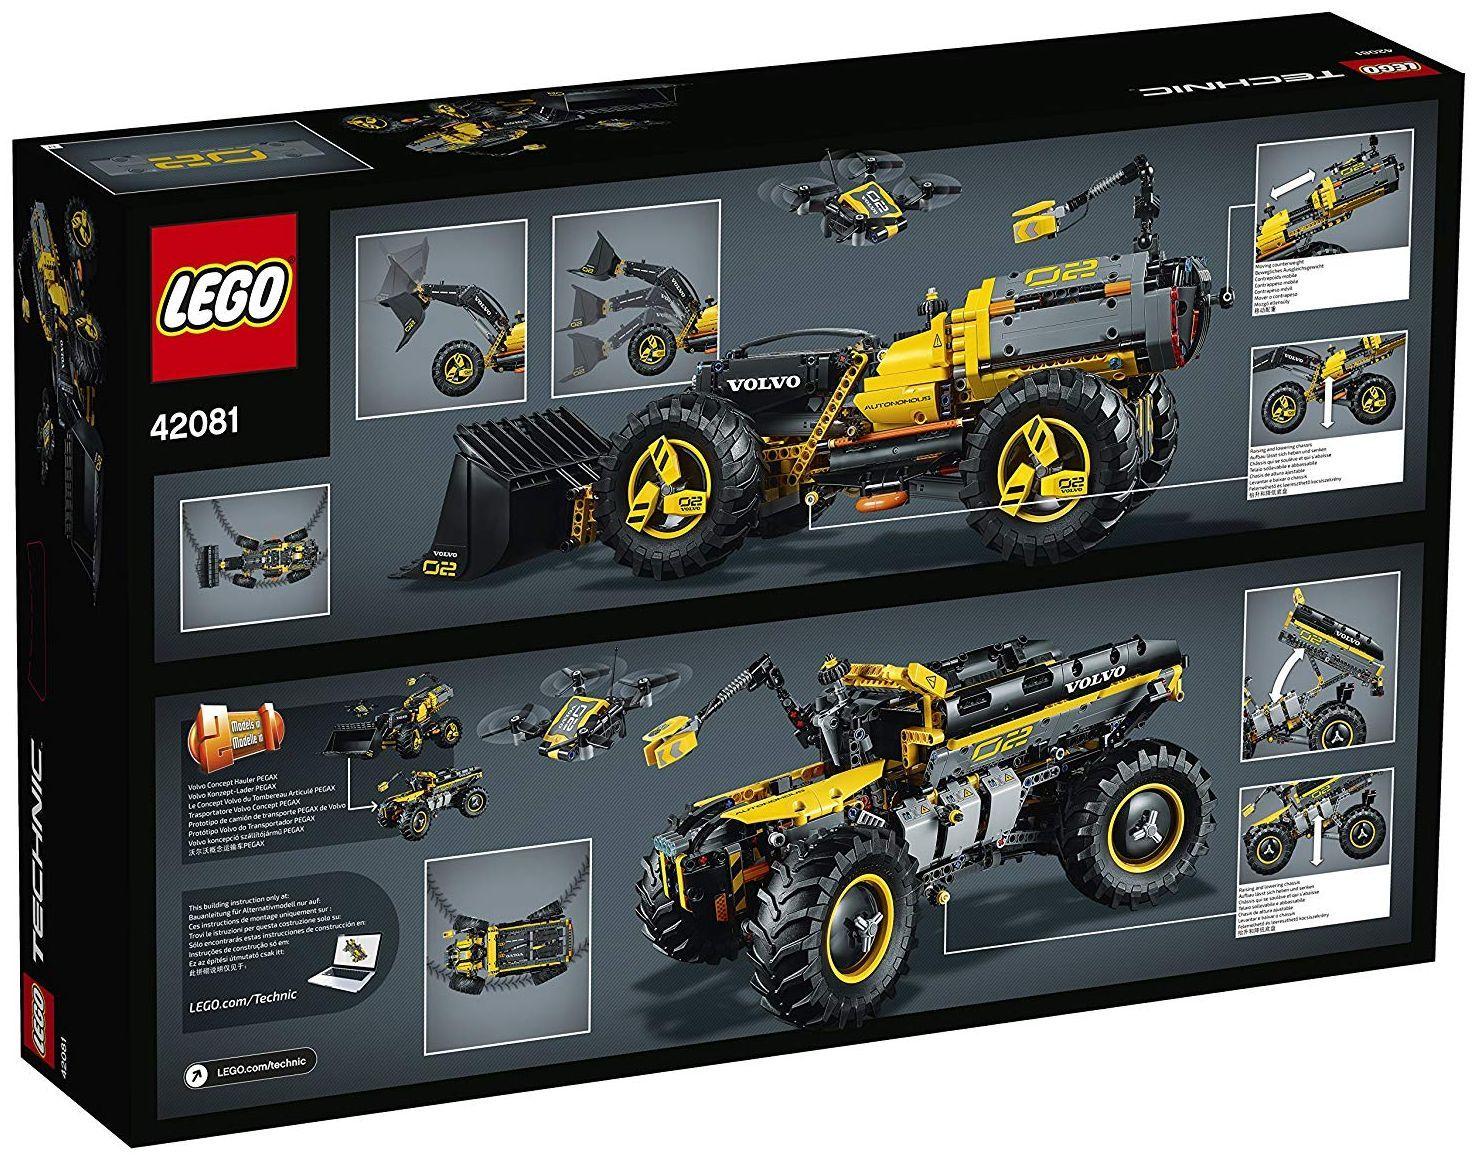 Конструктор Lego Technic - Volvo концепция, колесен товарач (42081) - 1